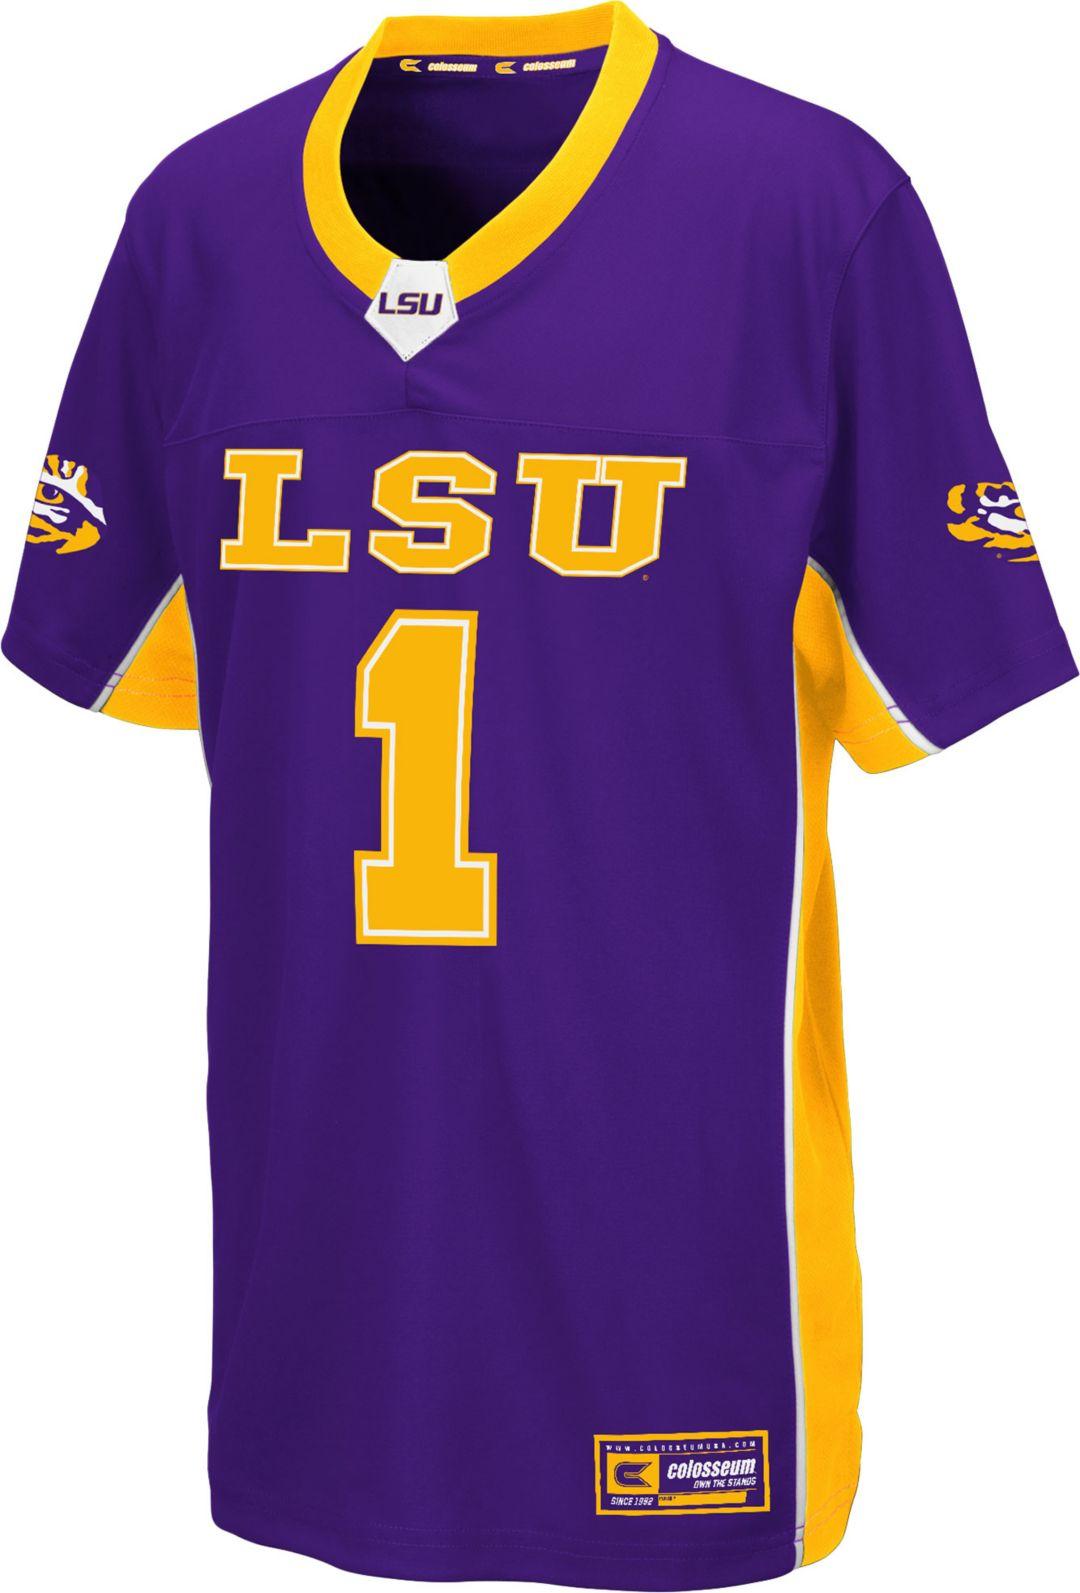 on sale 16b10 fdd33 Colosseum Youth LSU Tigers Purple Max Power Football Jersey